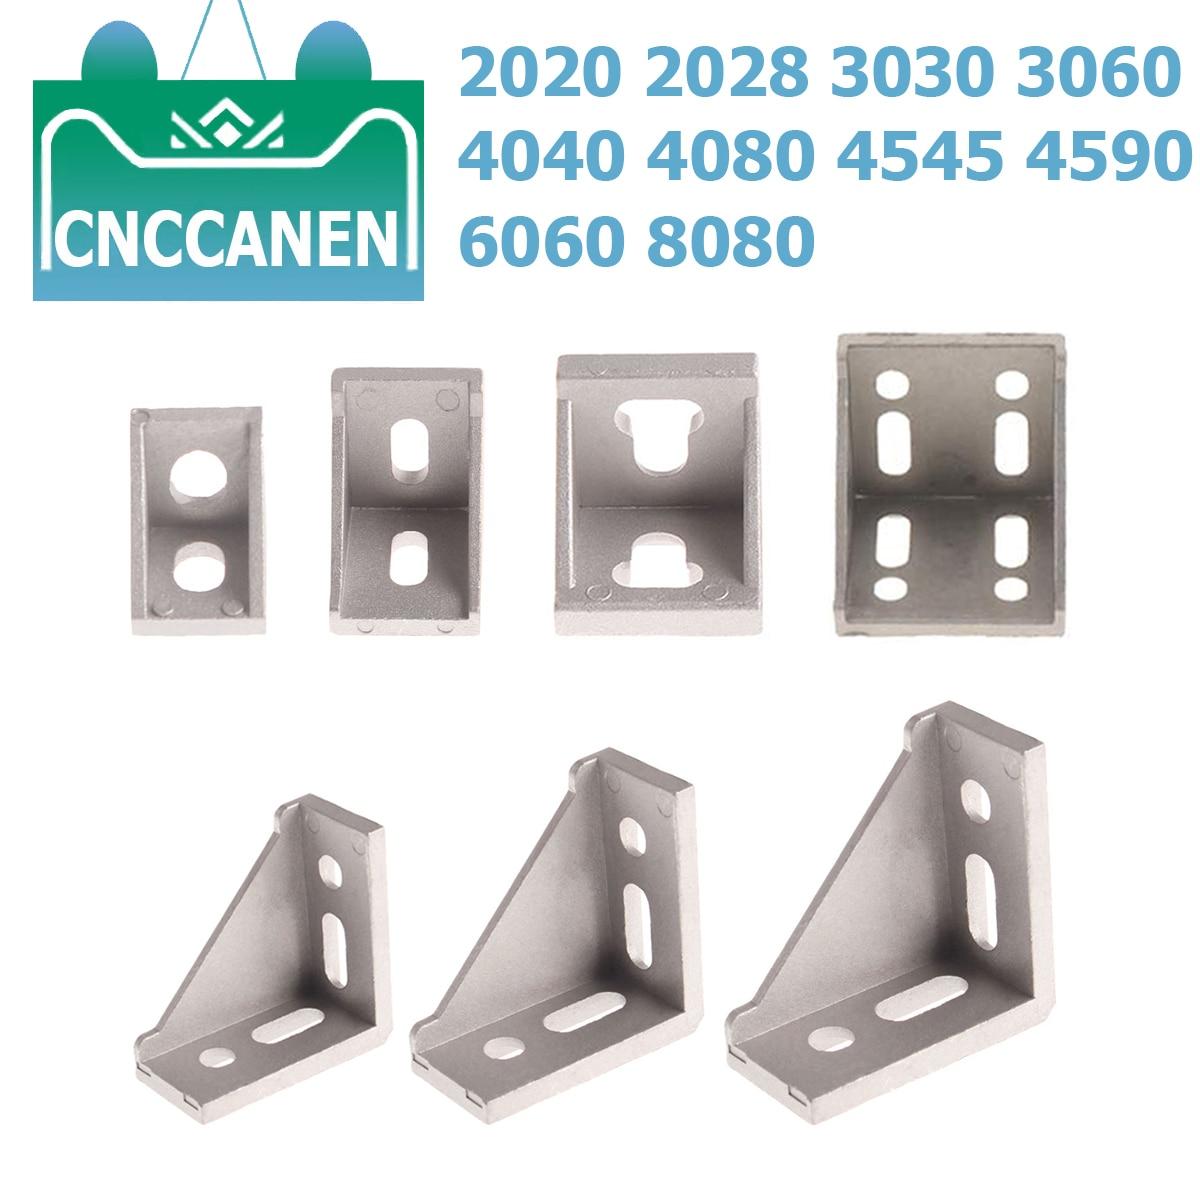 5pcs 3060 corner fitting angle aluminum L type connector bracket fastener